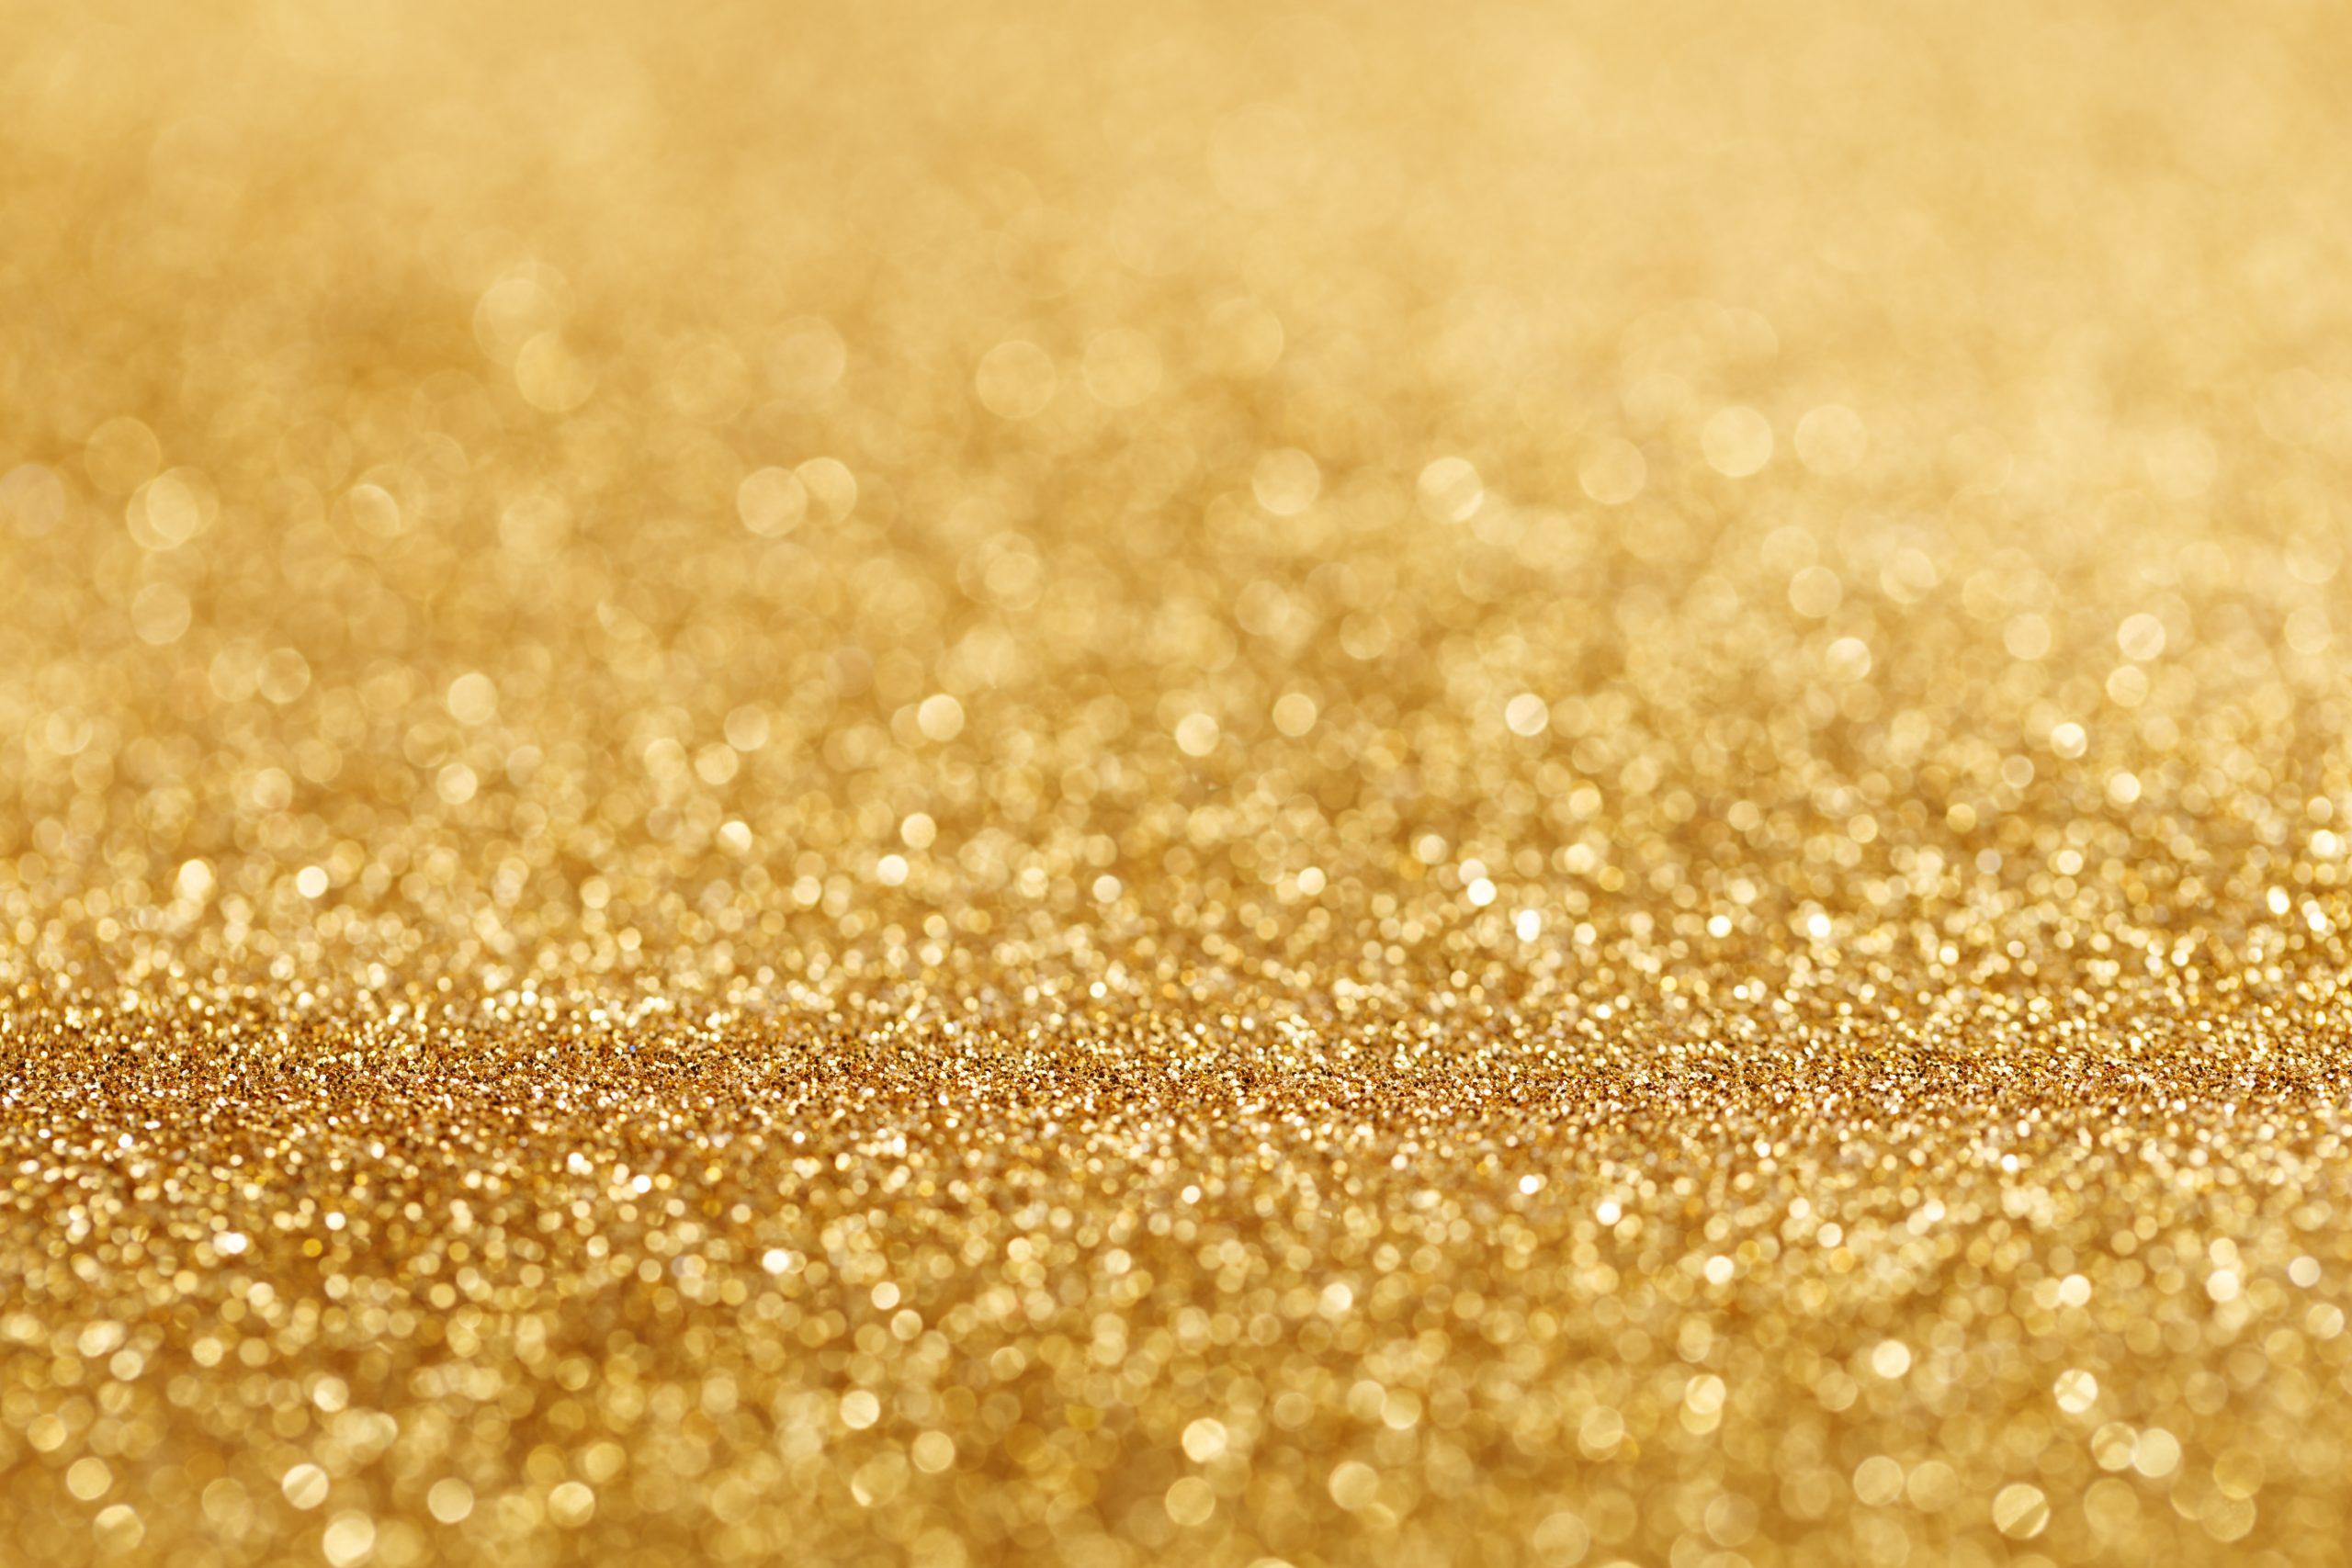 SPDR Gold Trust là gì?